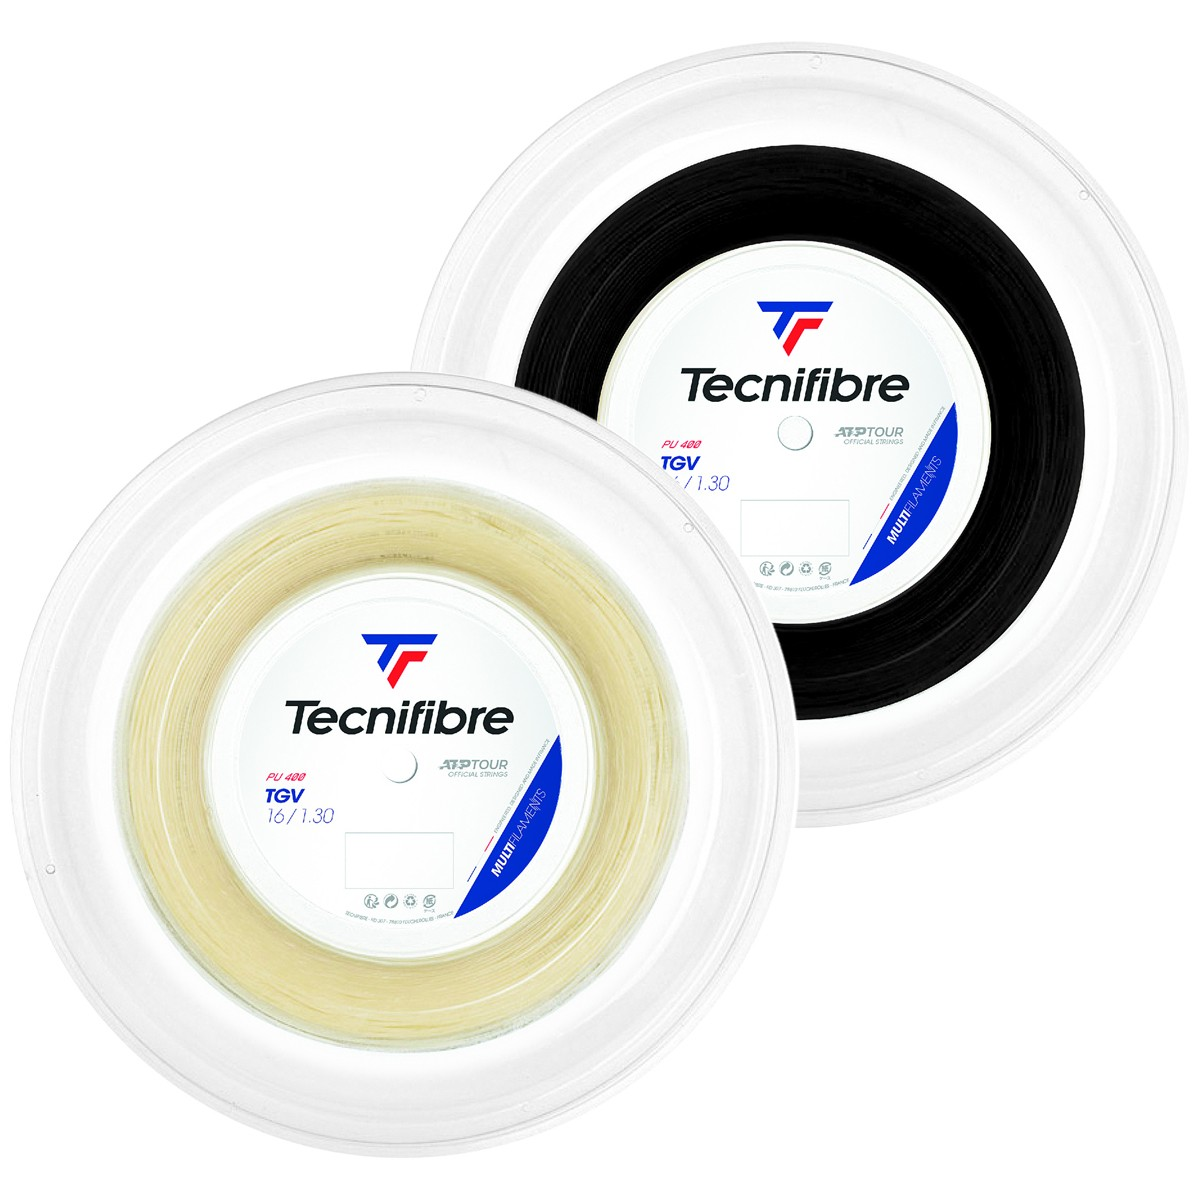 BOBINE TECNIFIBRE TGV (200 METRES)